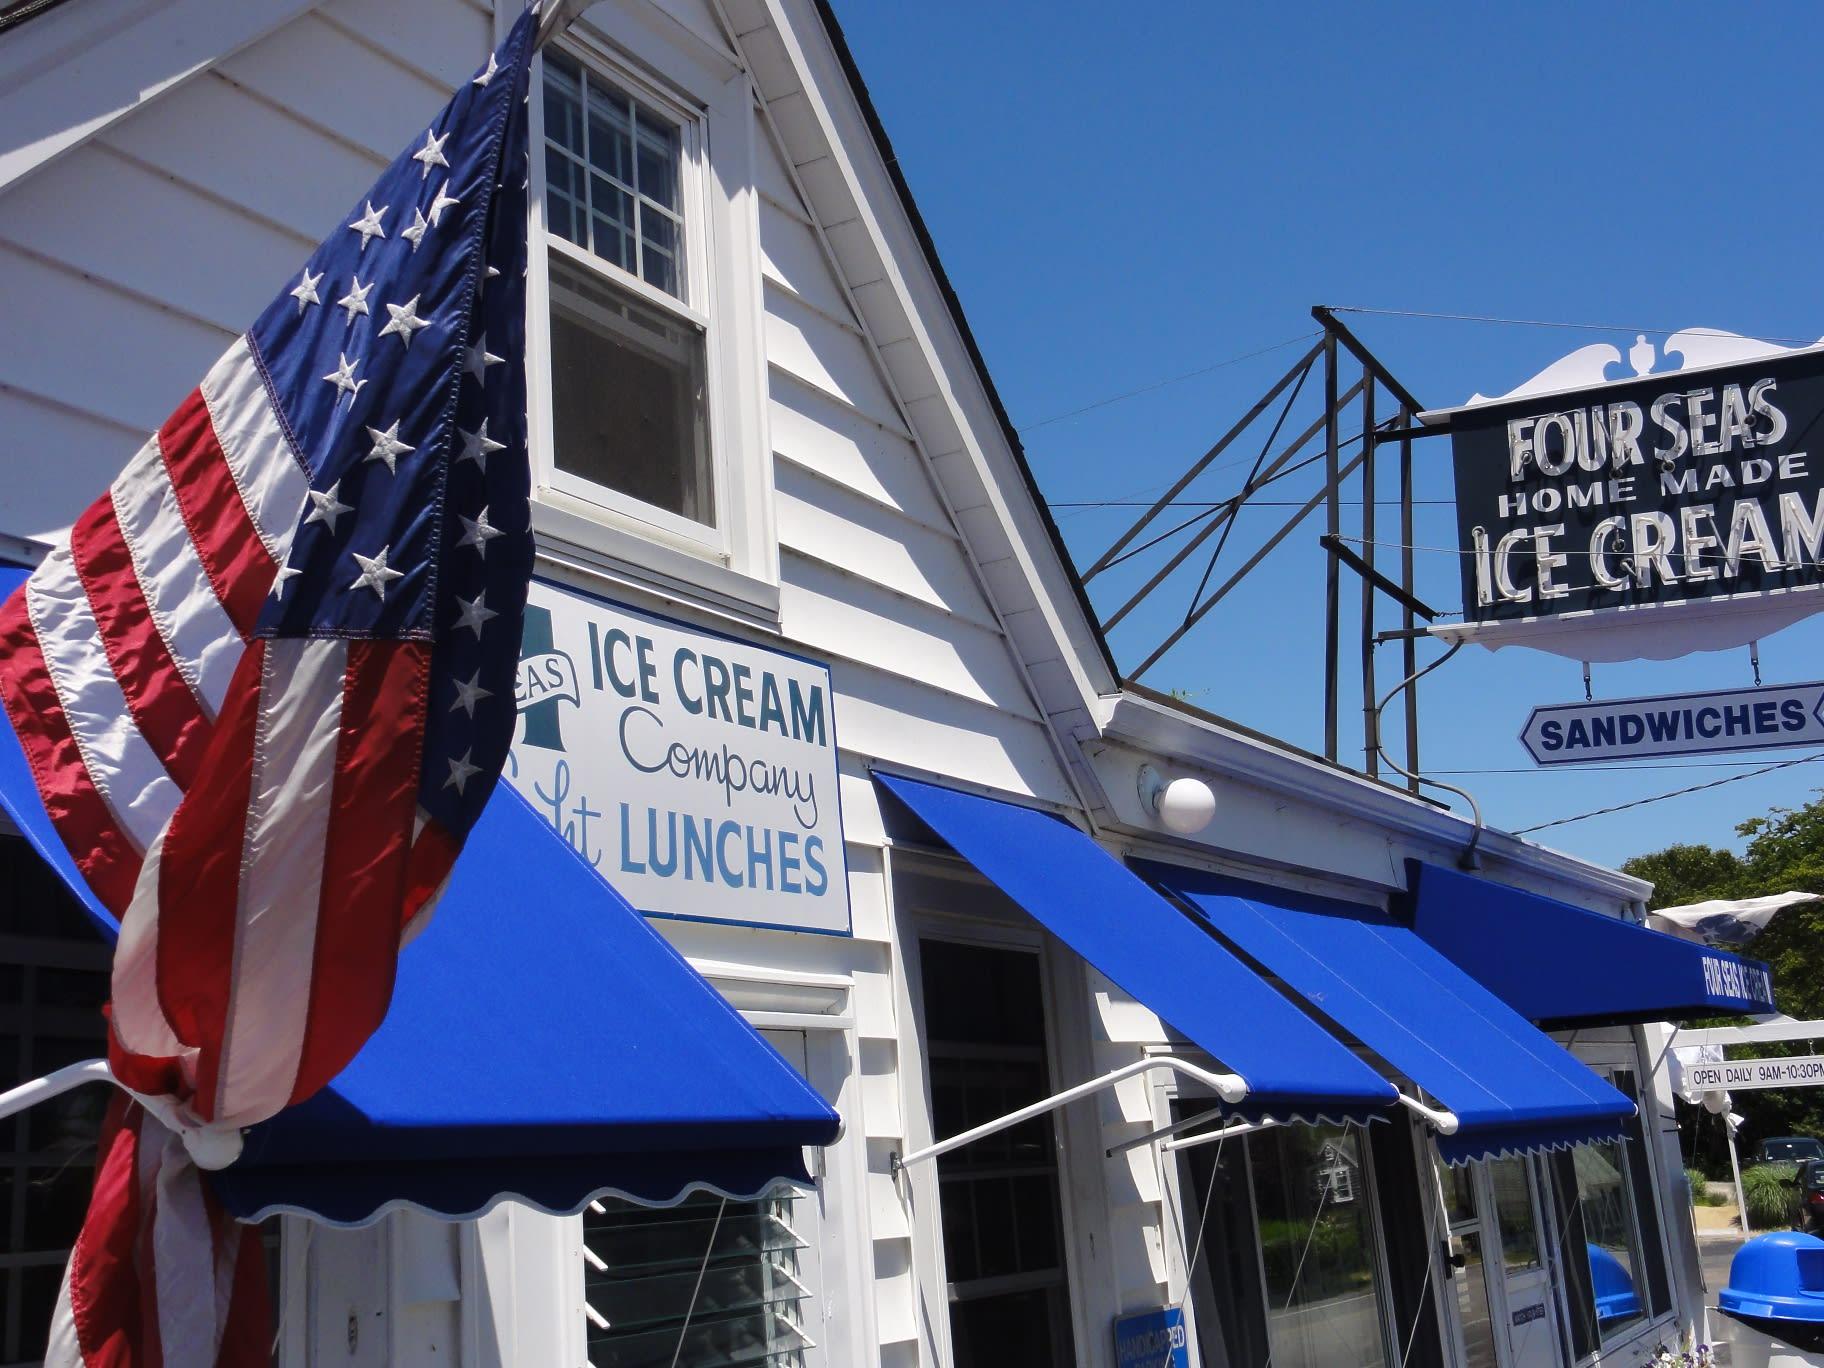 Four Seas Ice Cream at Four Seas Ice Cream